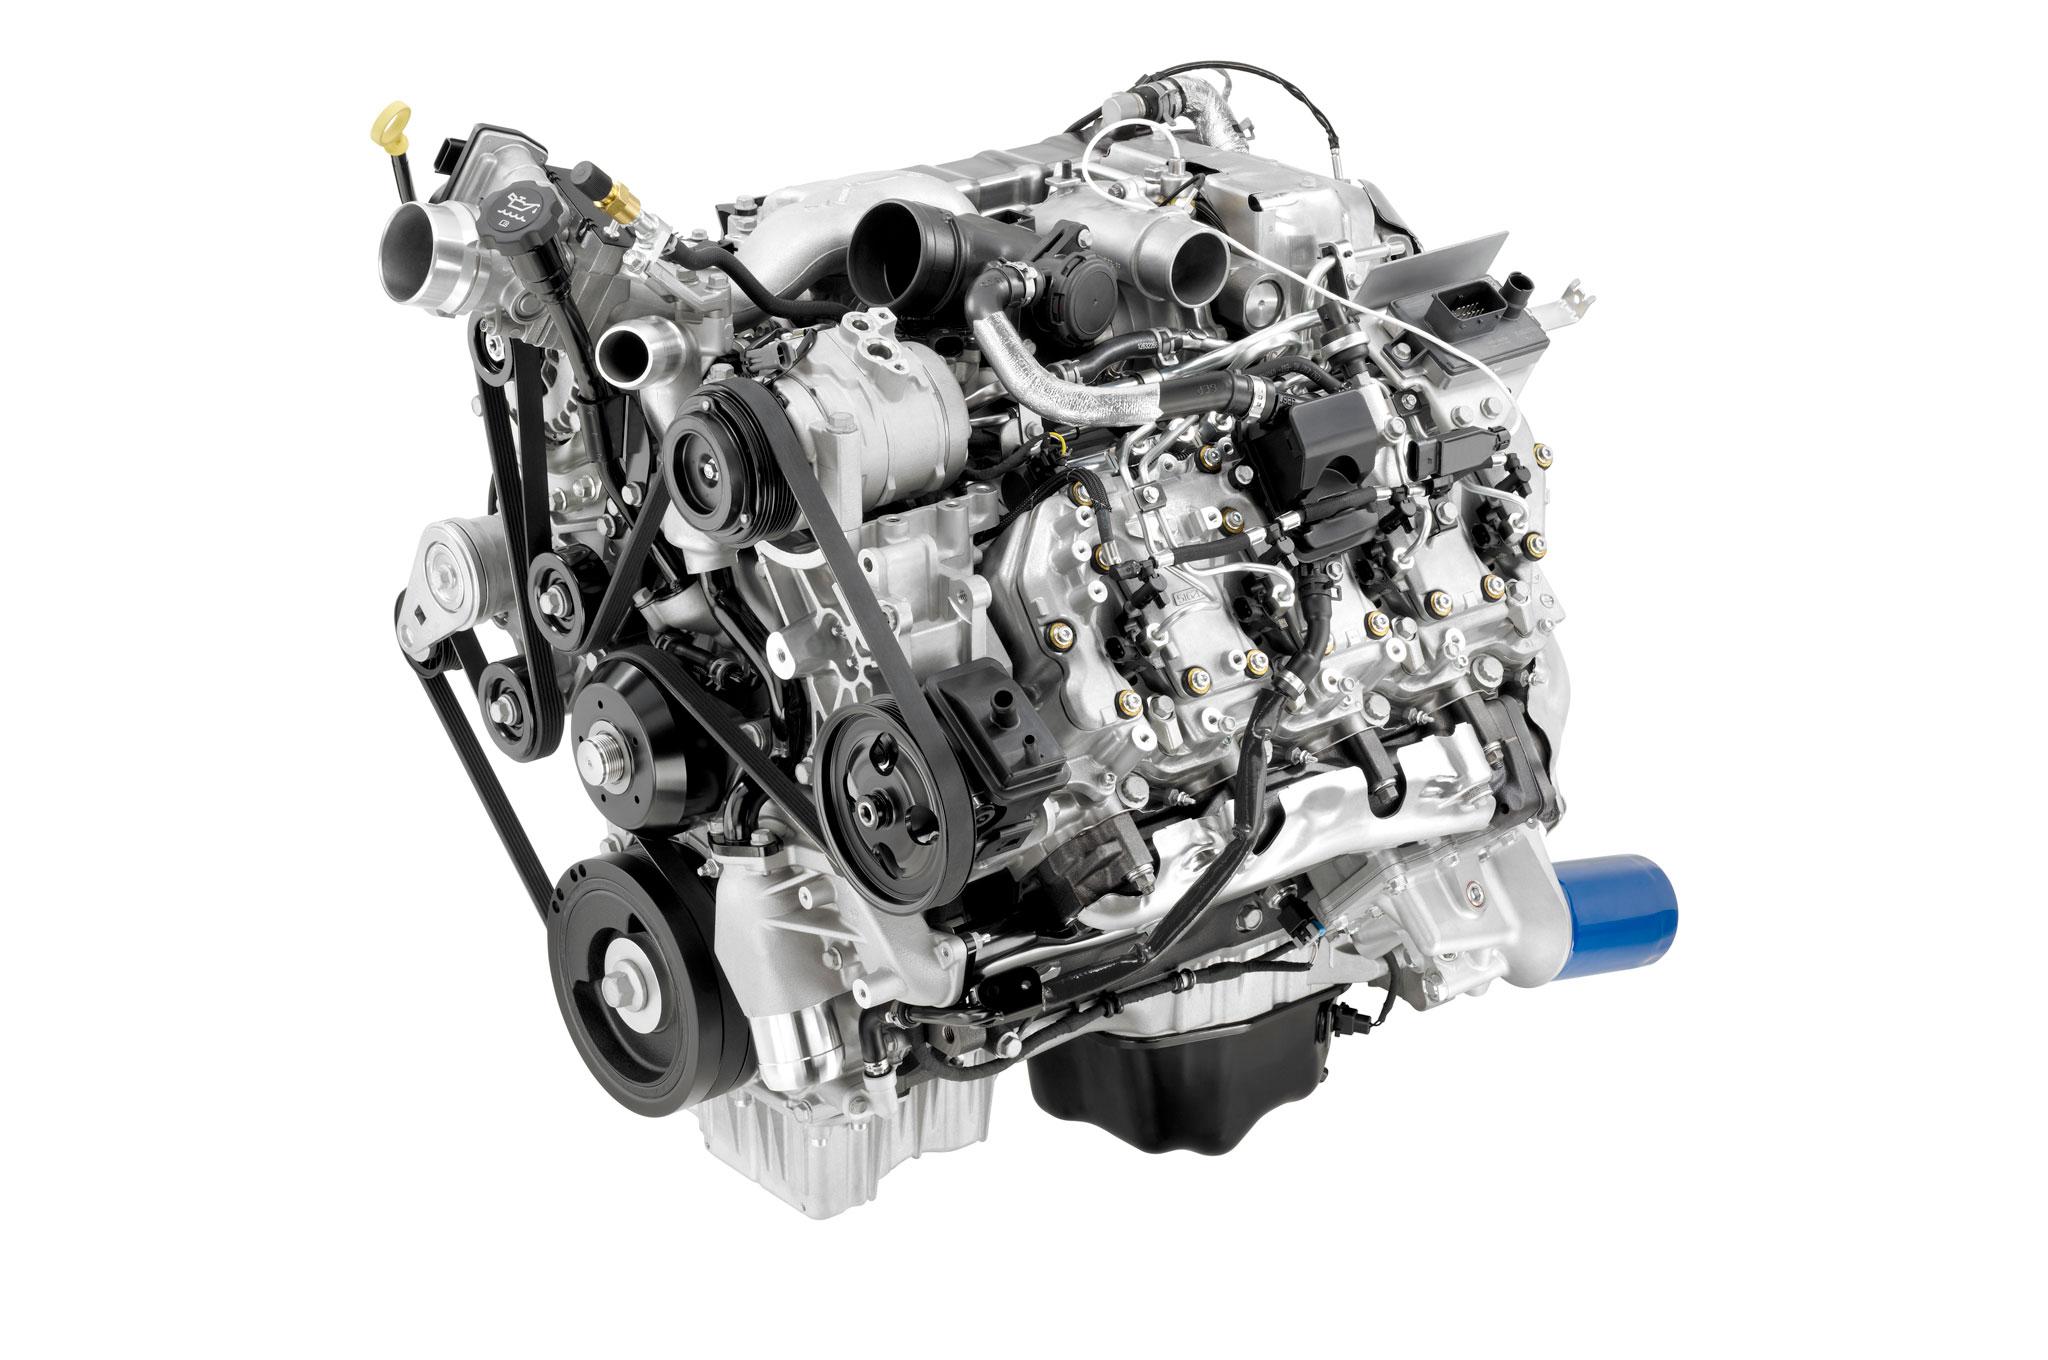 The General Motors Duramax Engine Through History